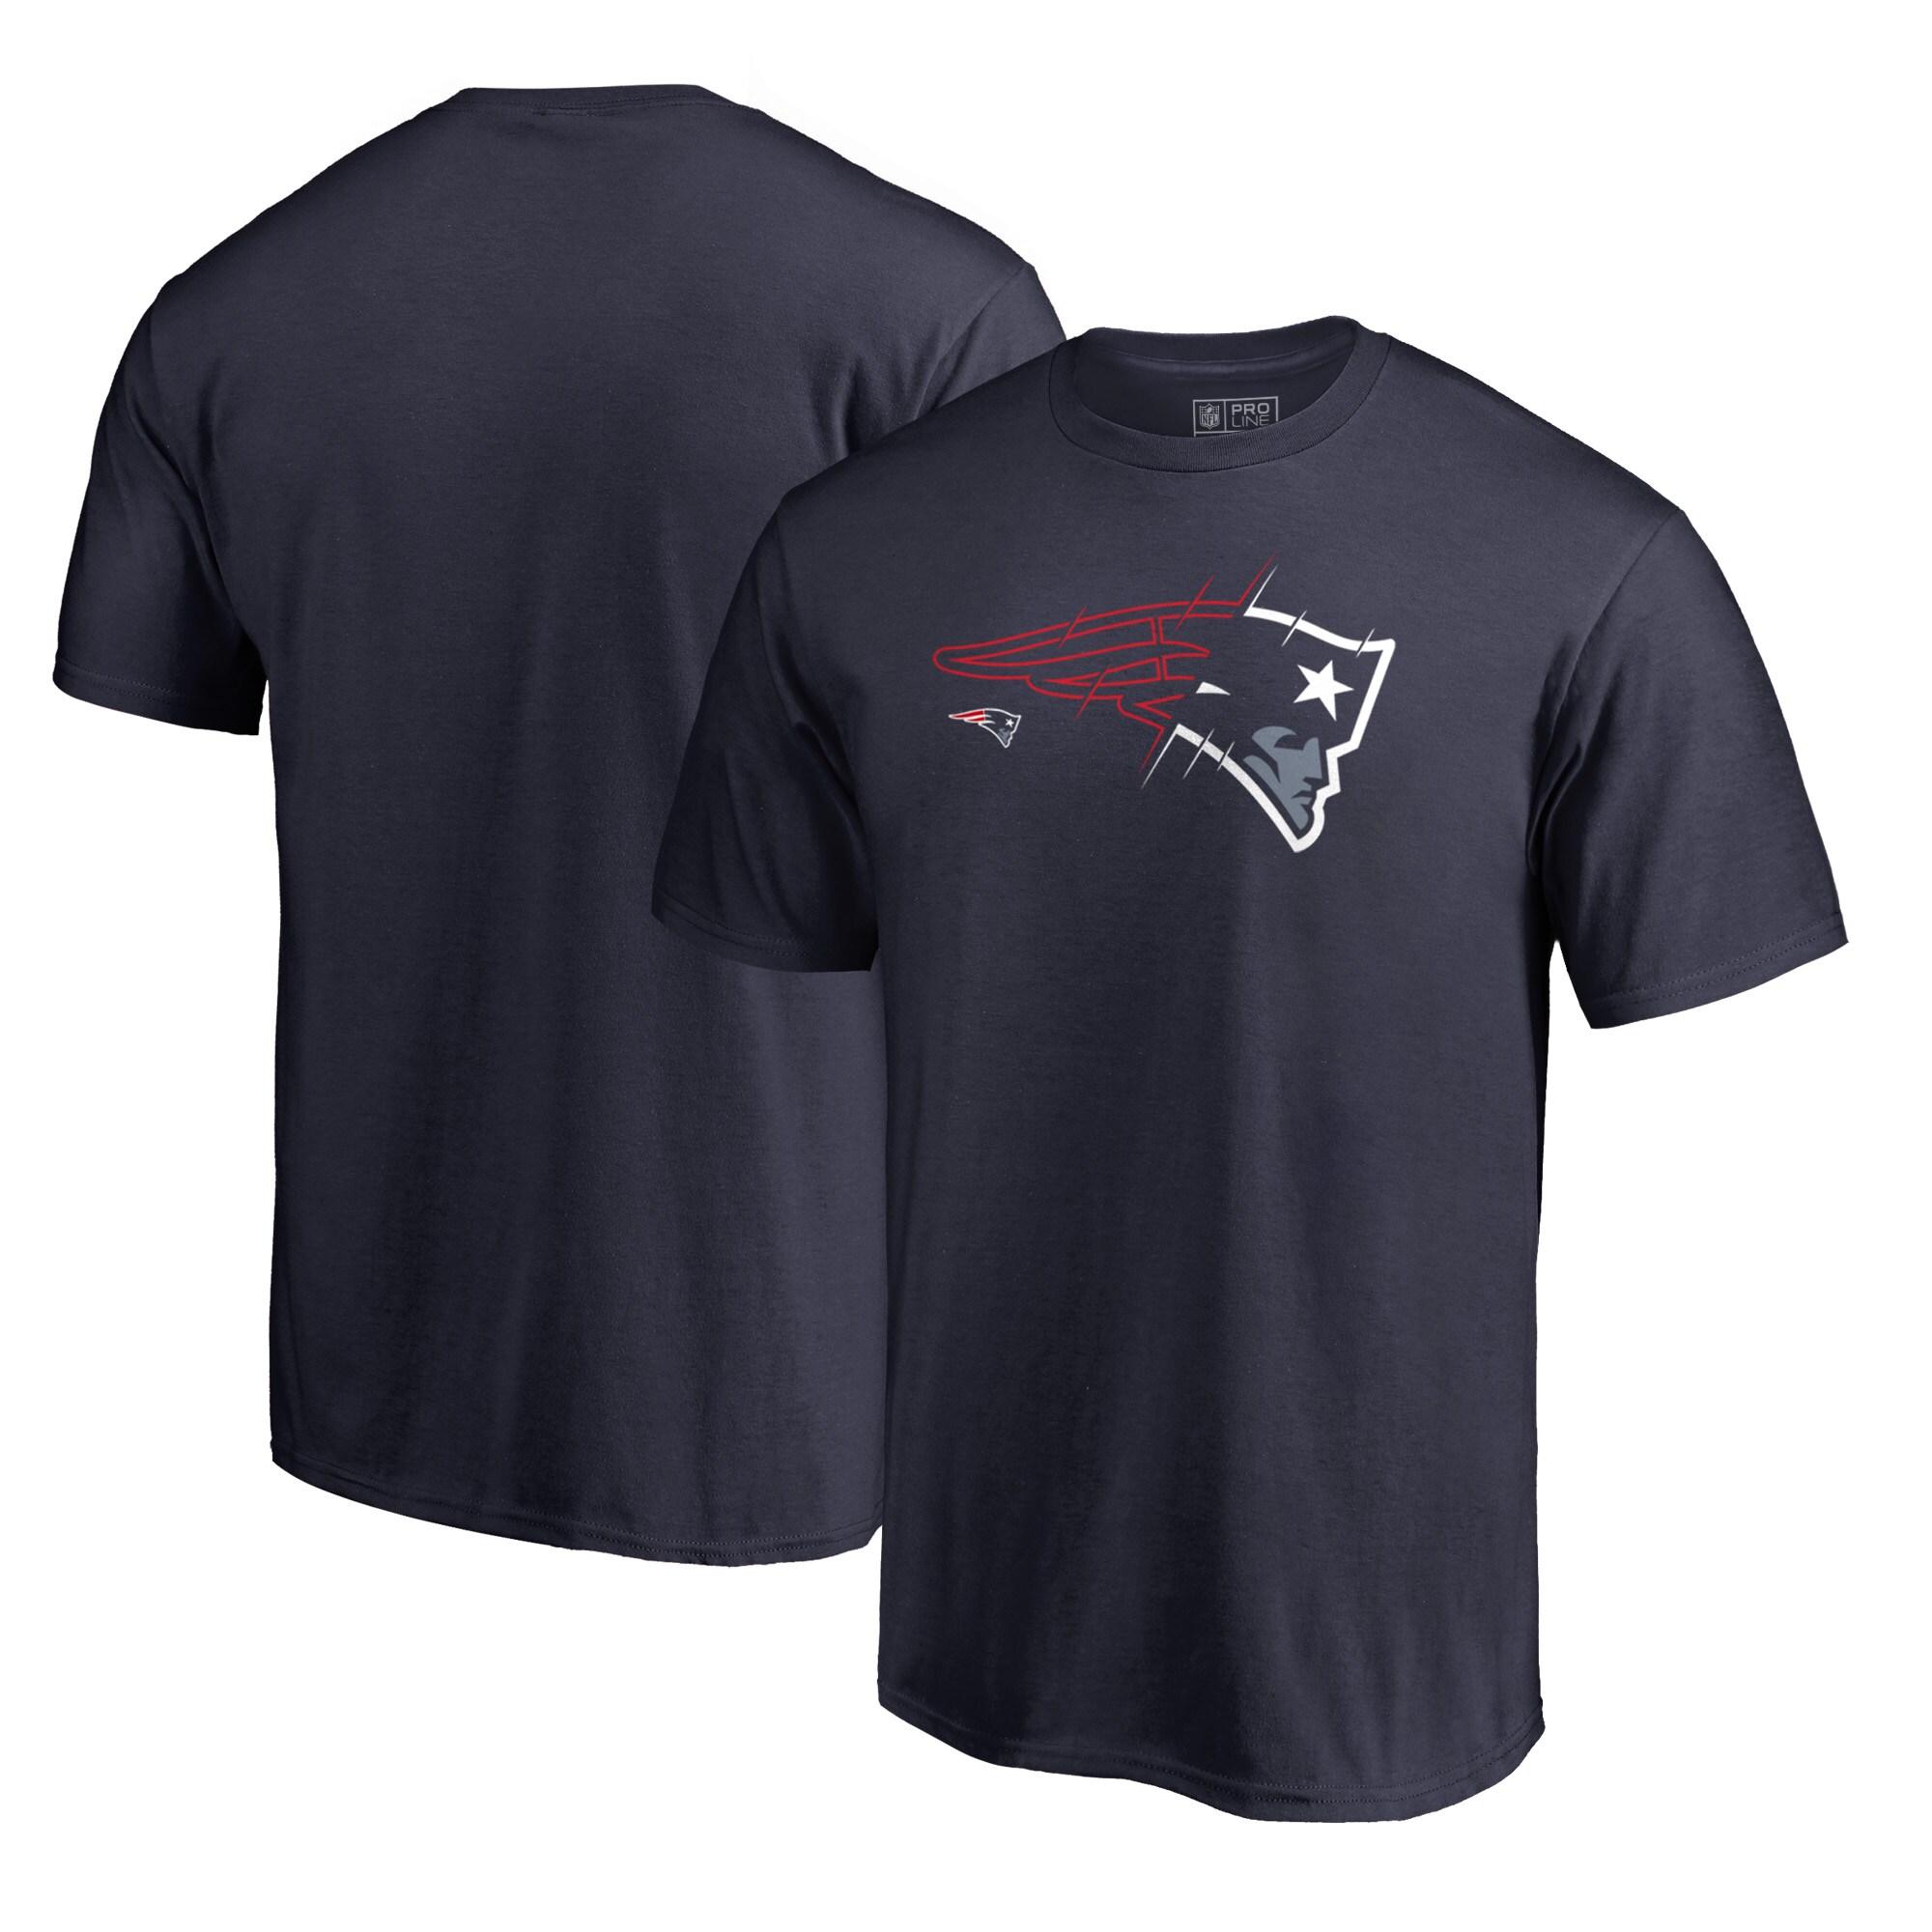 New England Patriots NFL Pro Line by Fanatics Branded X-Ray T-Shirt - Navy